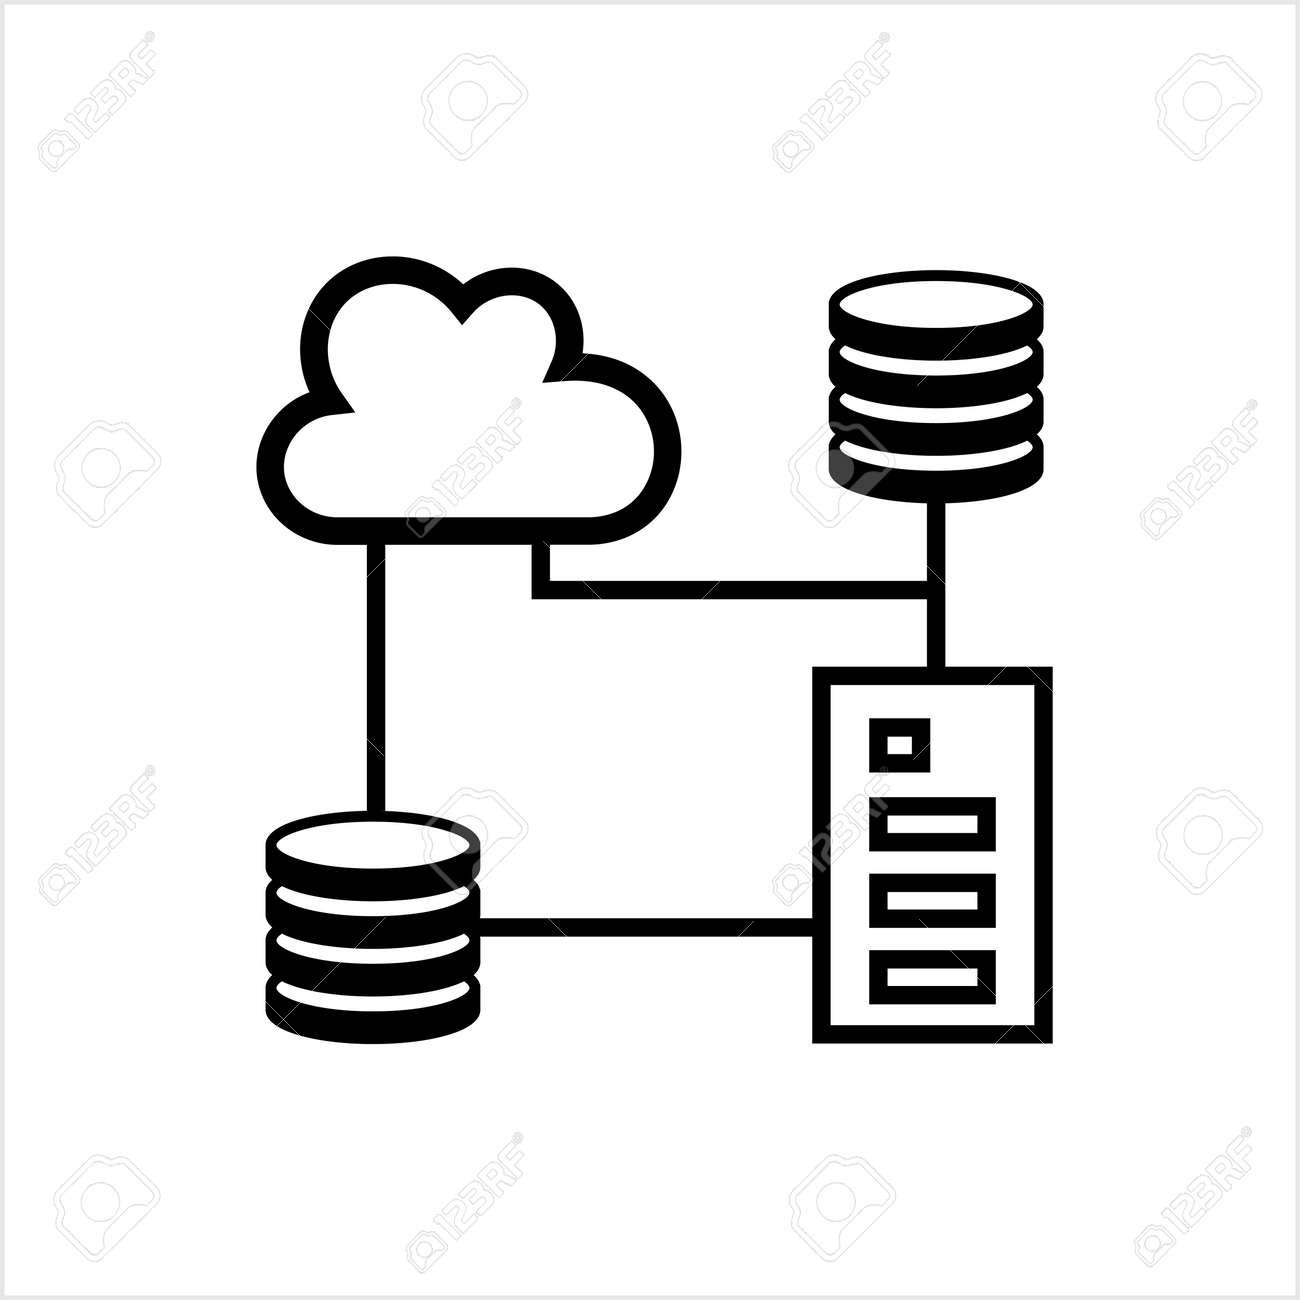 Cloud Database Icon, Data Base Icon Vector Art Illustration - 149571089